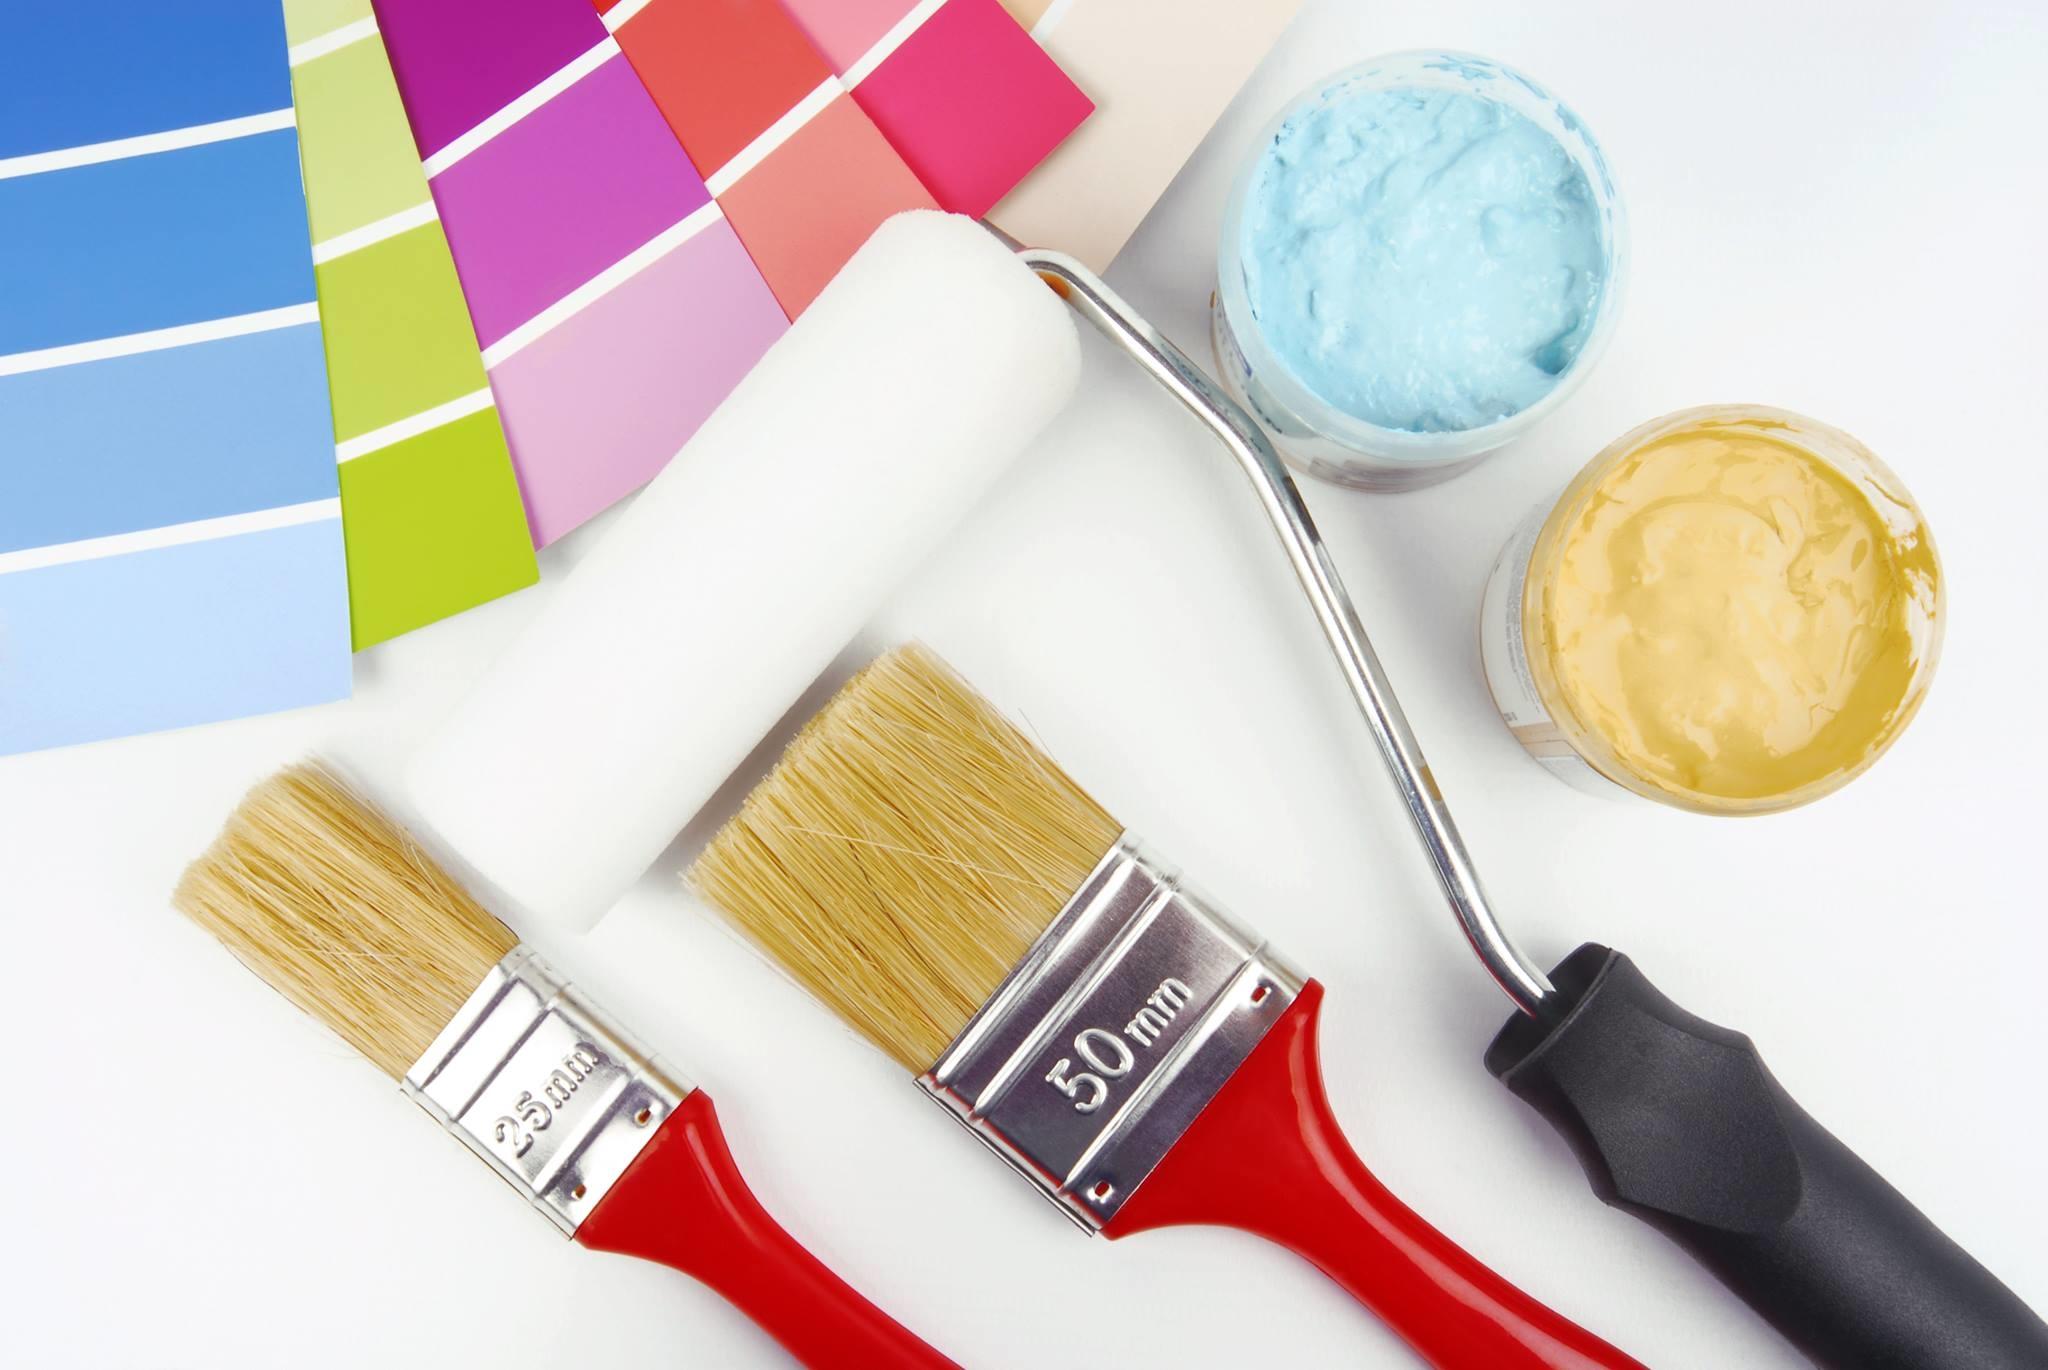 Colormart Paint Store image 5